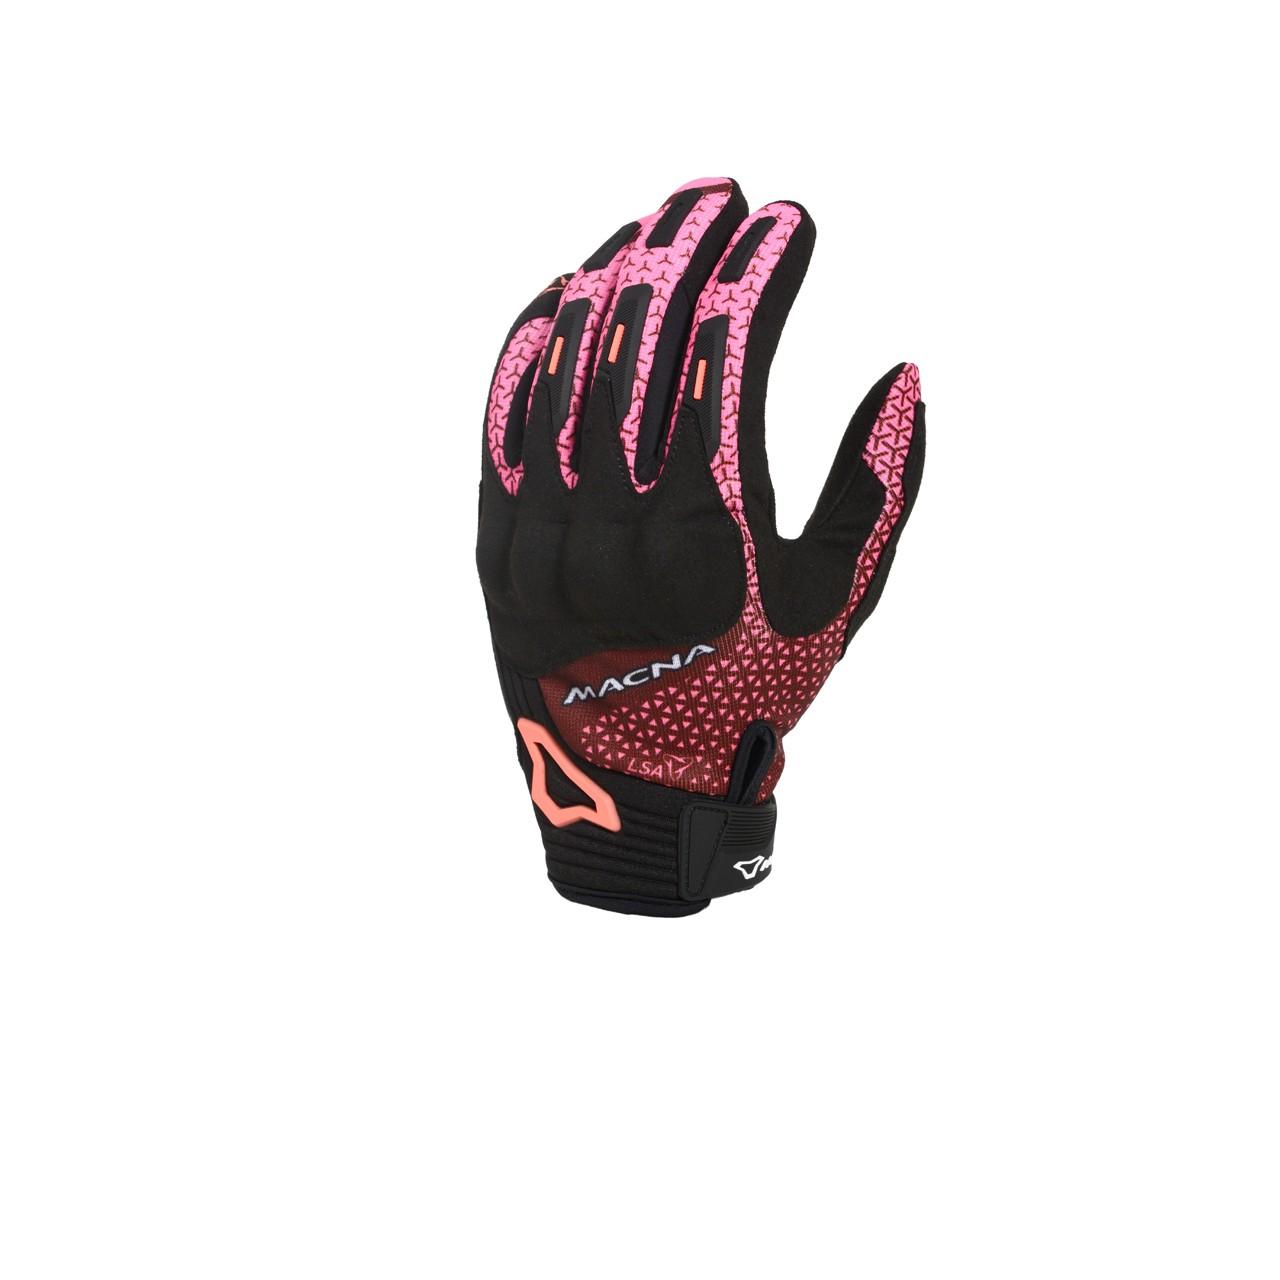 Pirštinės MACNA Octar (Ladies) (Black/Burgundy/Pink)